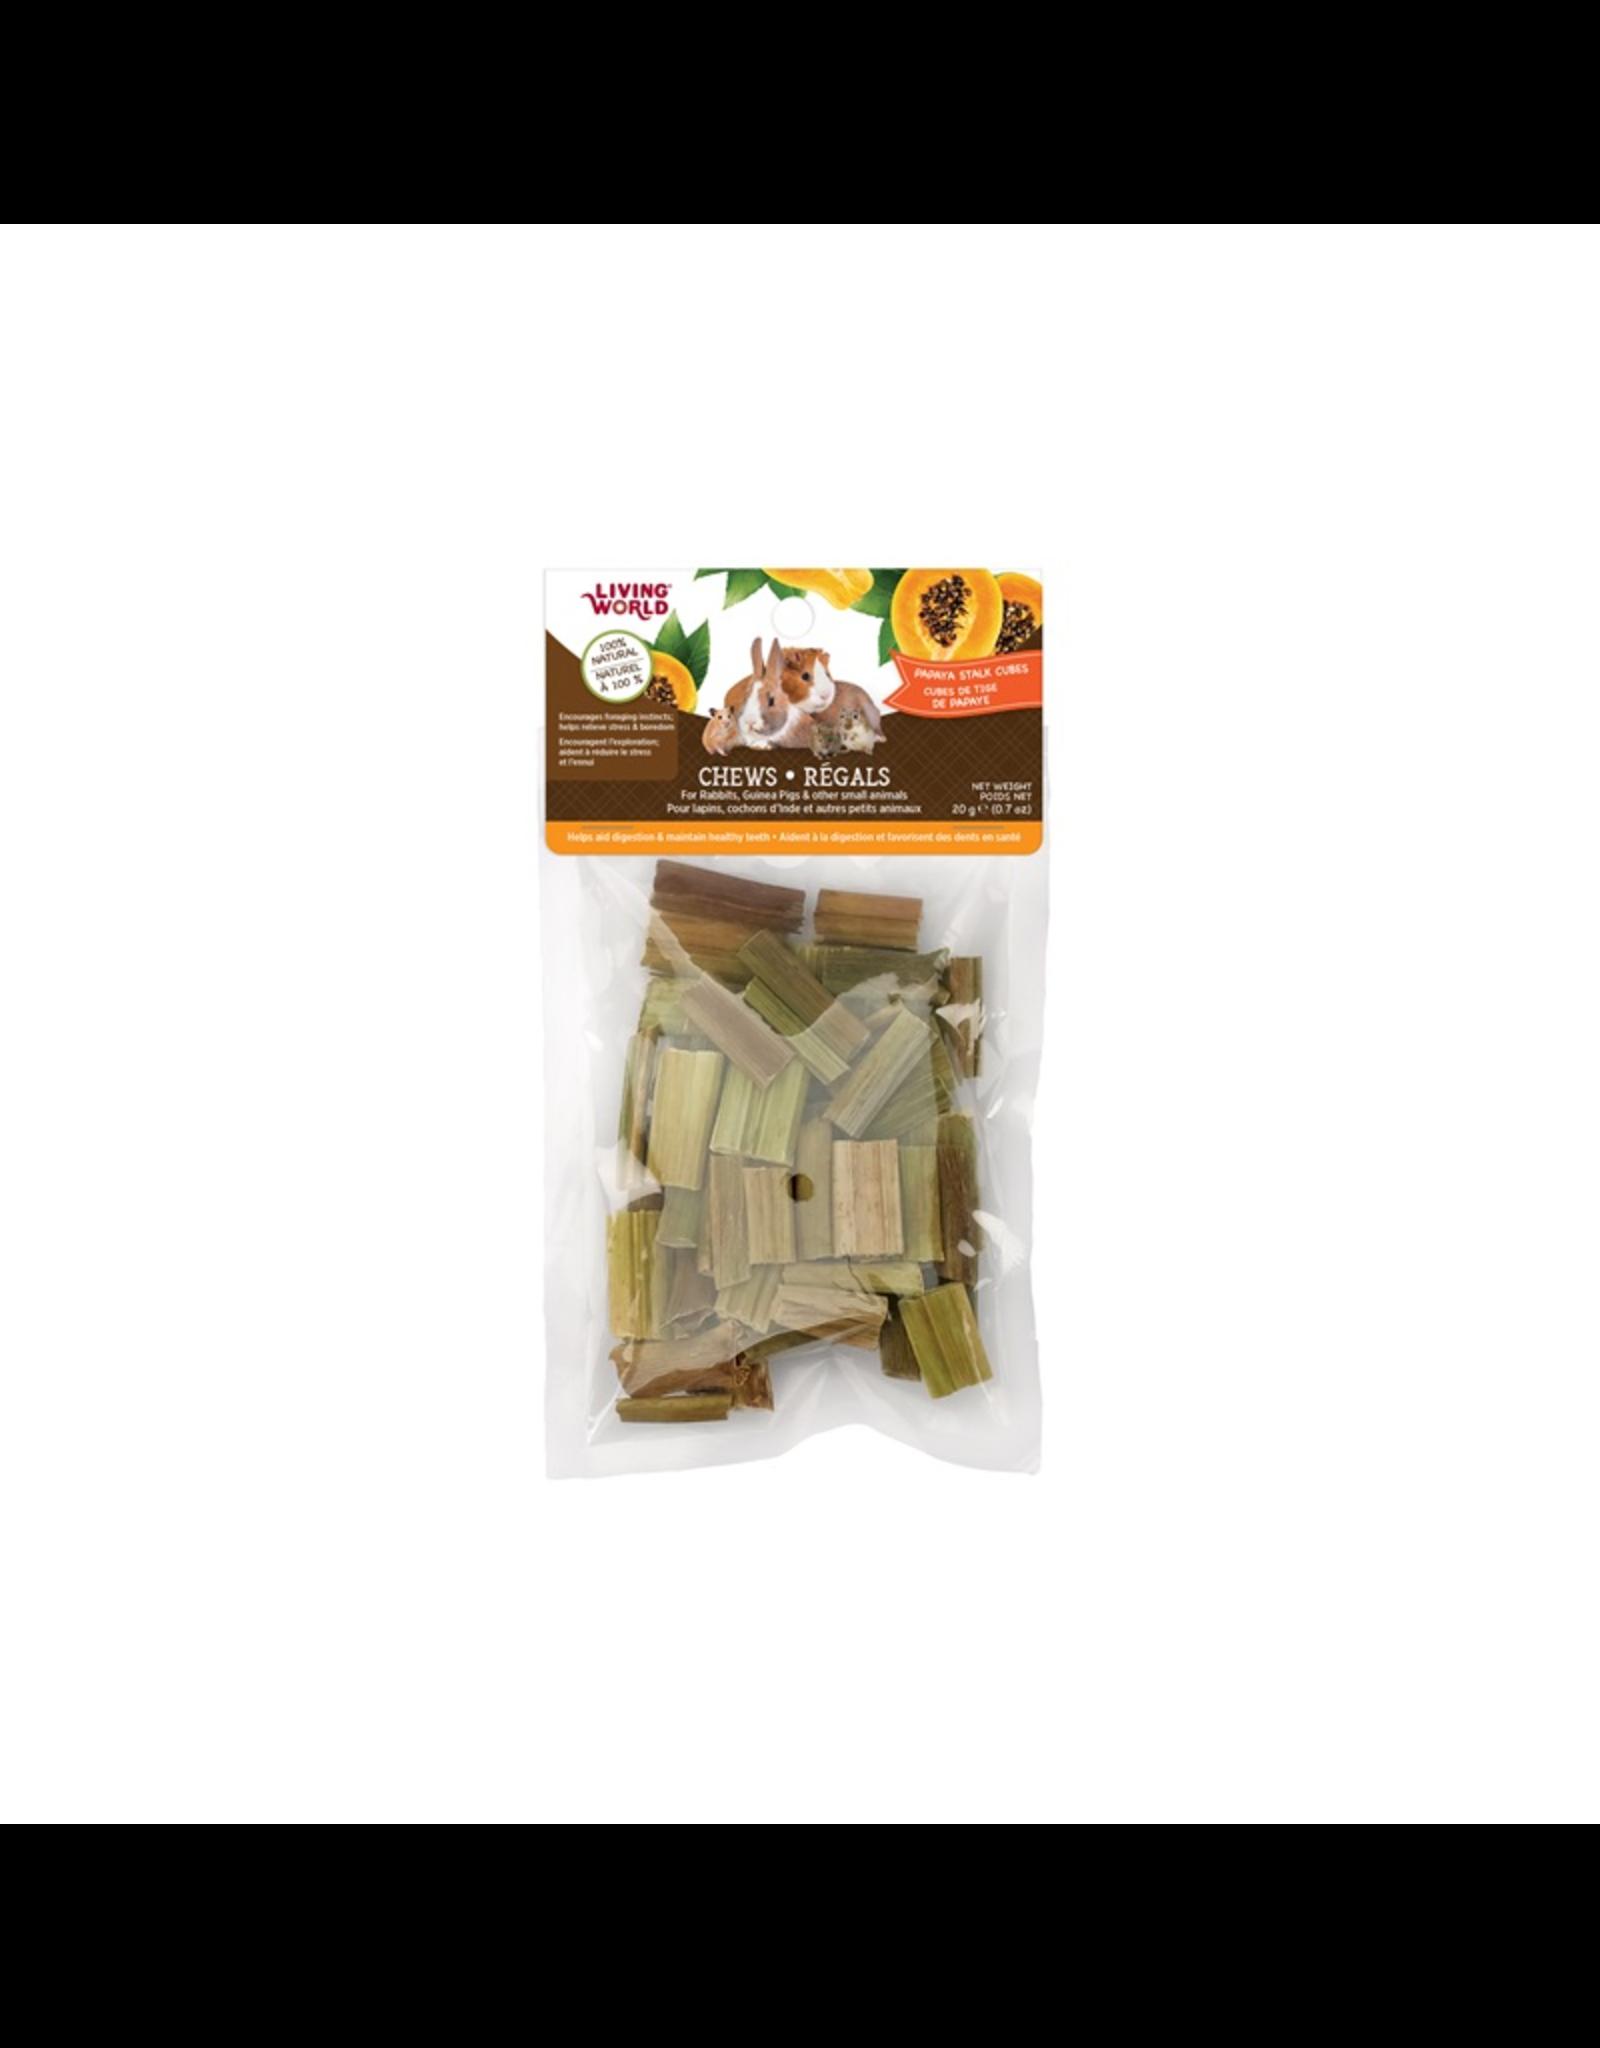 Living World Living World Small Animal Chews, Papaya Stalk Cubes, 20 g